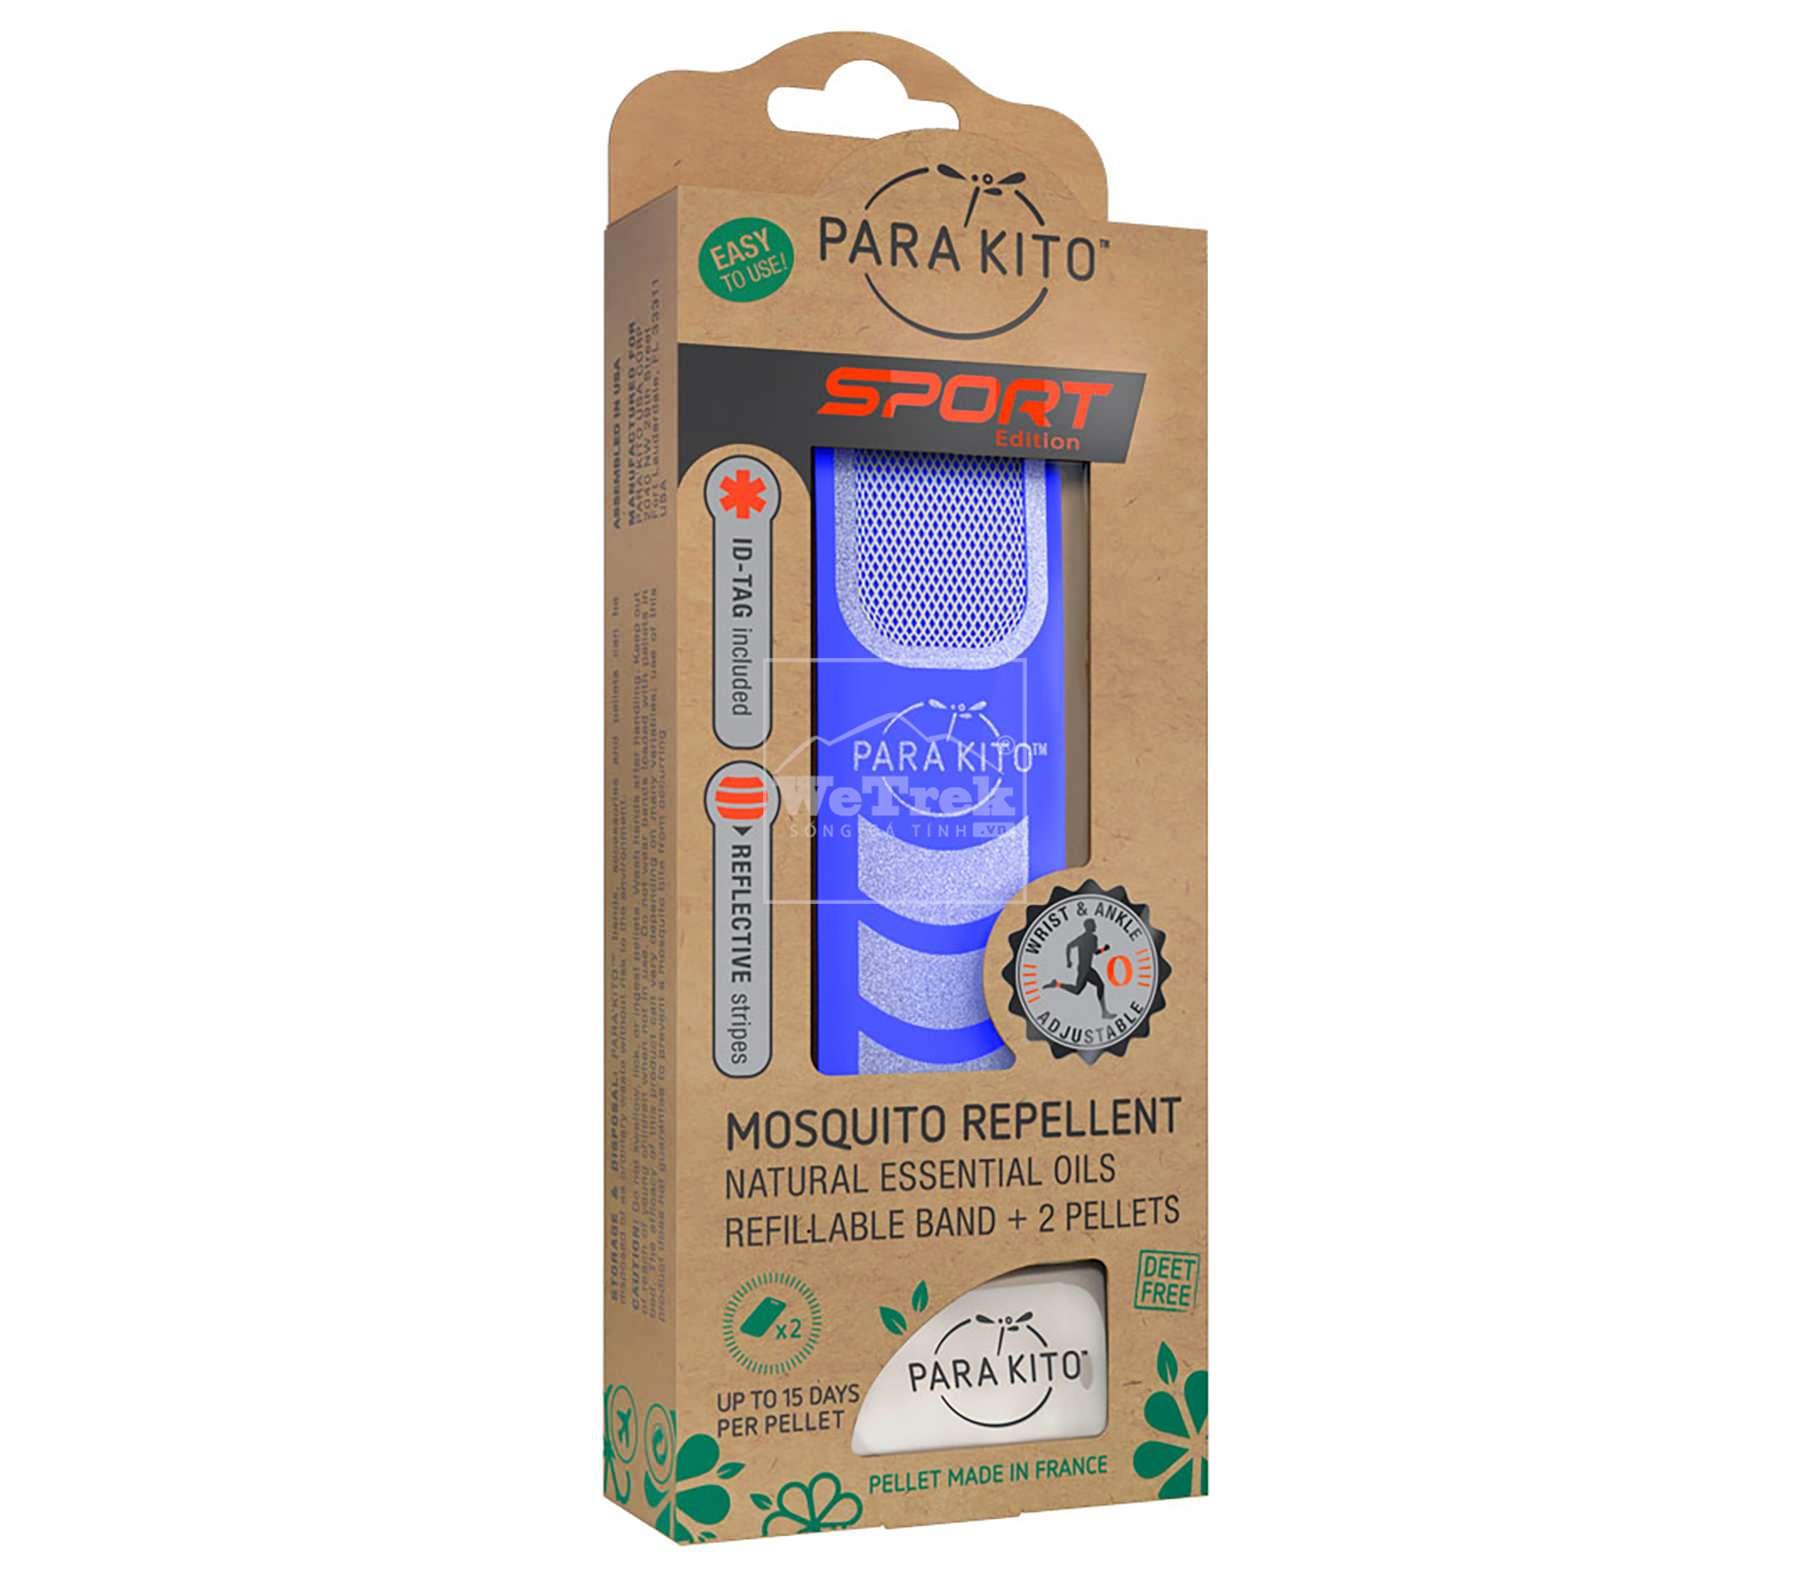 vong-deo-tay-chong-muoi-the-thao-Parakito-Blue-Sport-Band-8025-xanh-duong-1.jpg